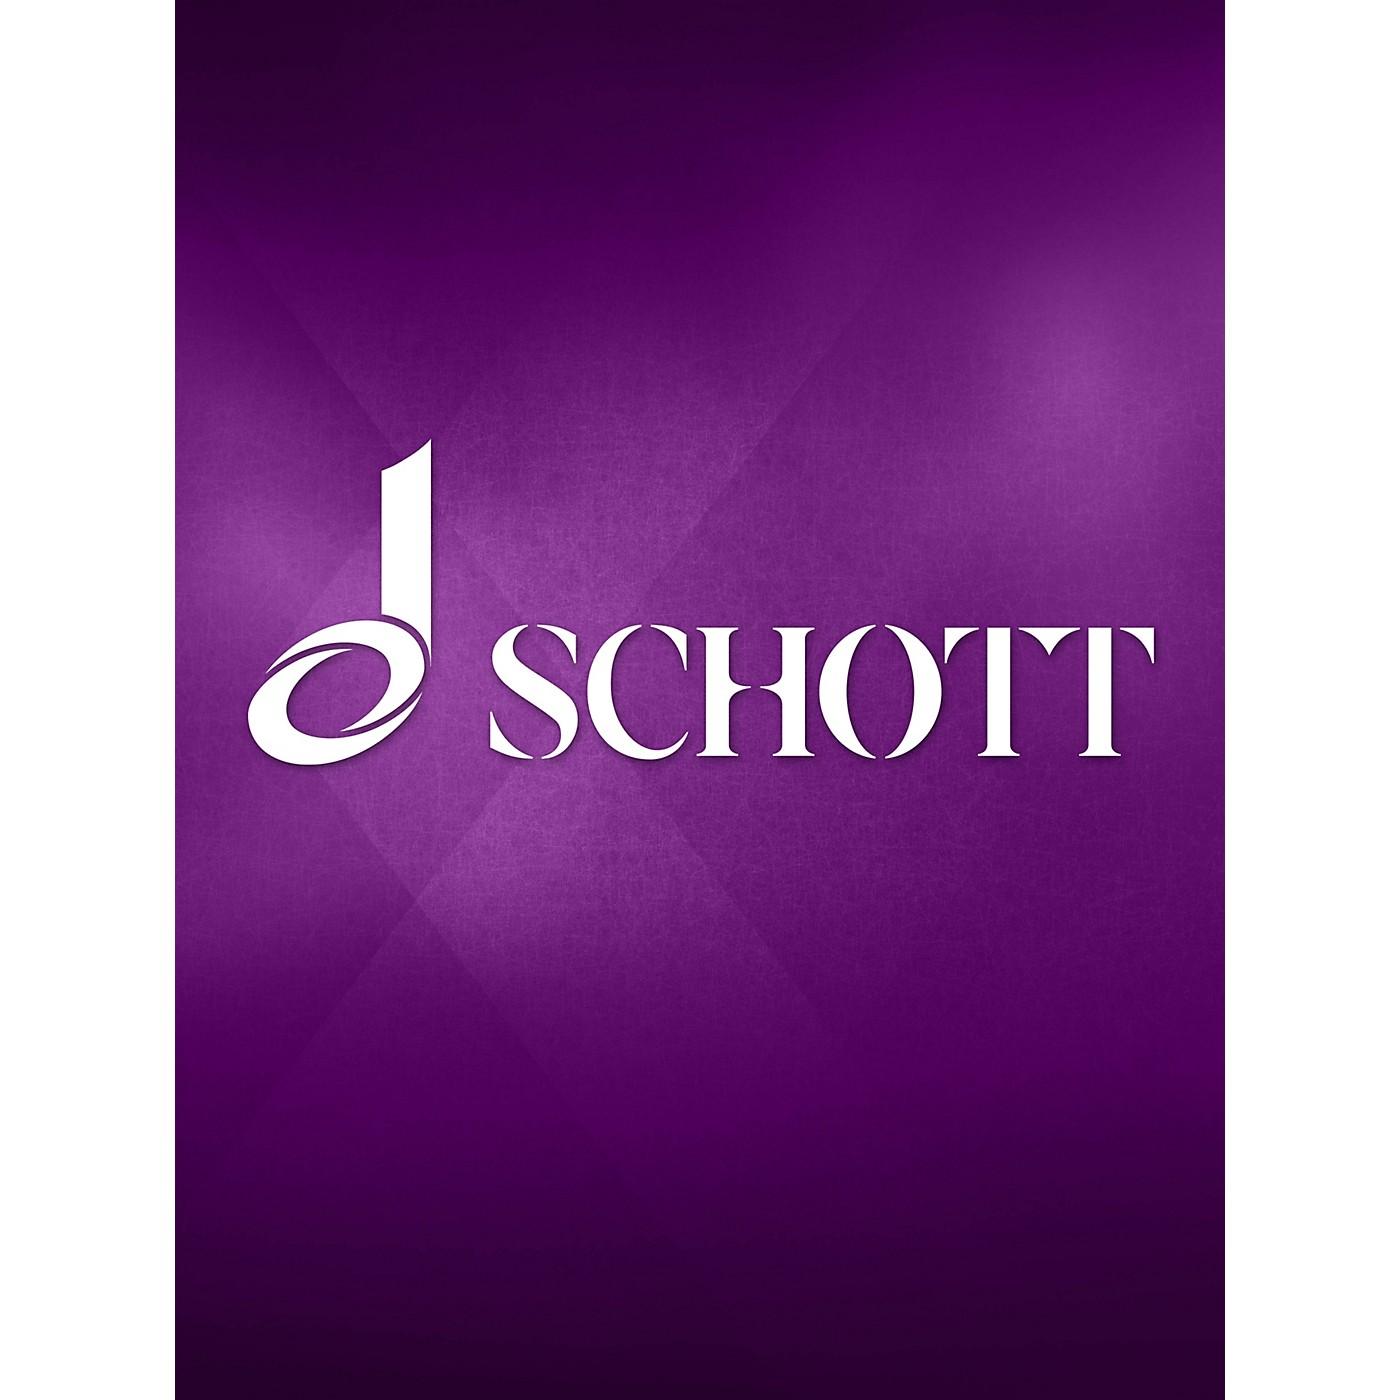 Schott Revelation Of New Life Op. 8 (Advent Cantata - Score (German)) Score Composed by Bertold Hummel thumbnail